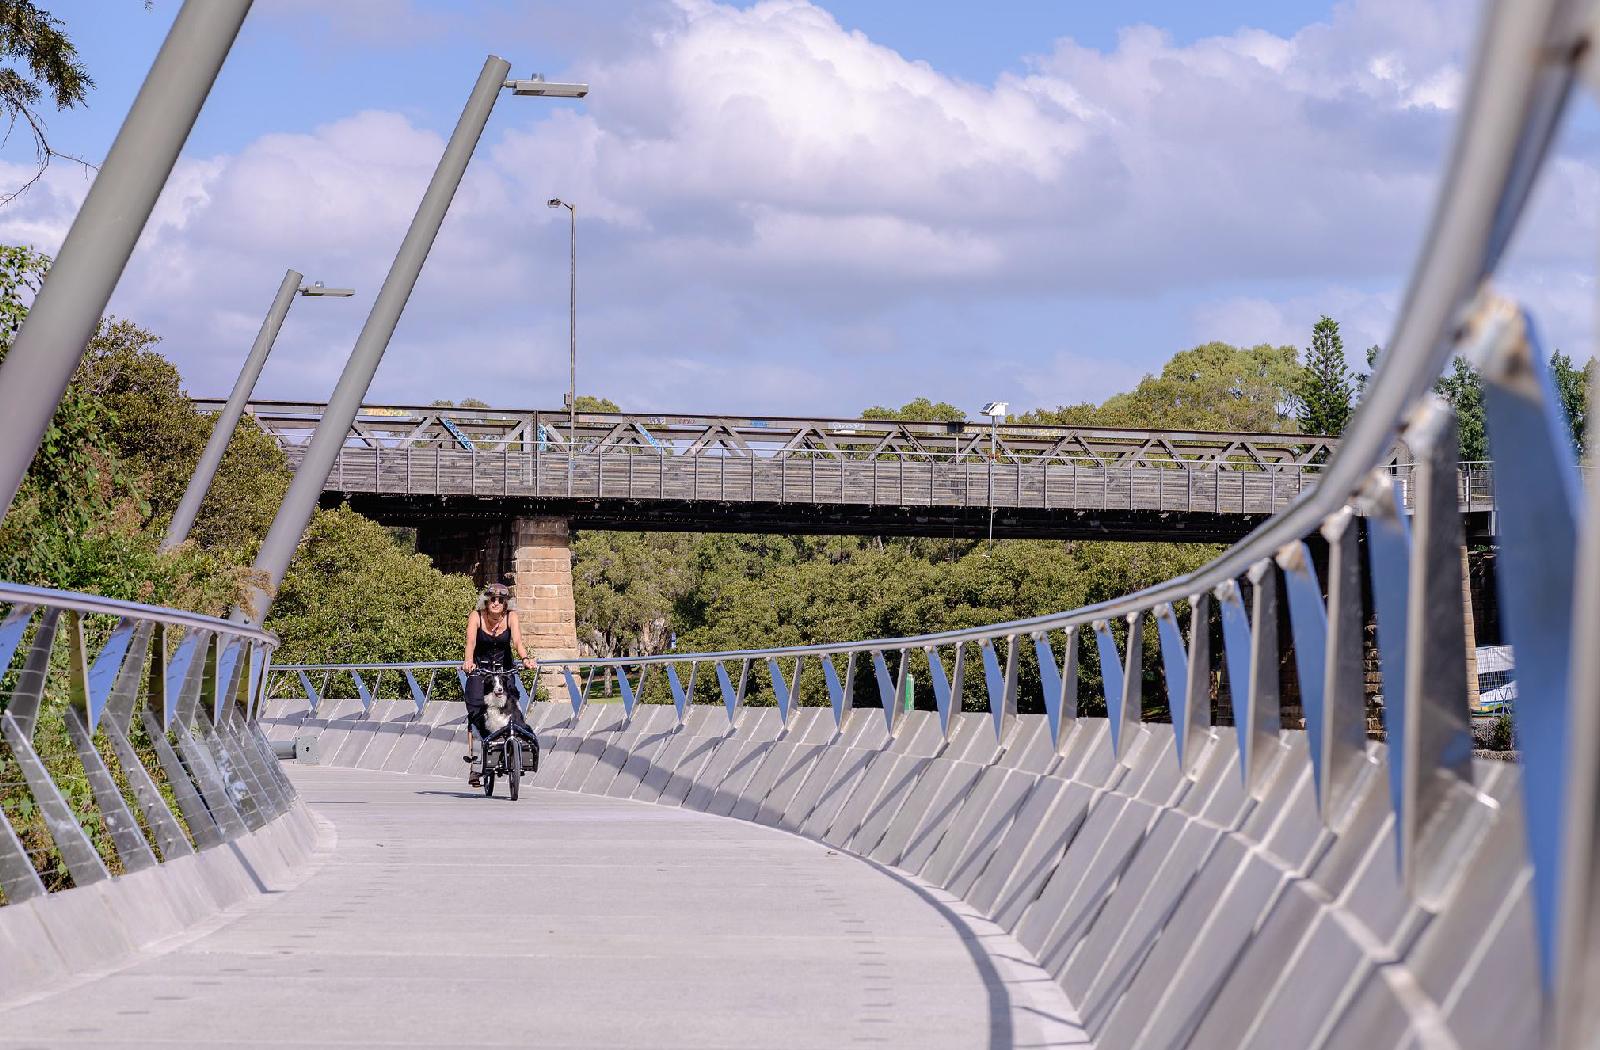 The Parramatta Escarpment Boardwalk - an urban design project by McGregor Westlake Architecture